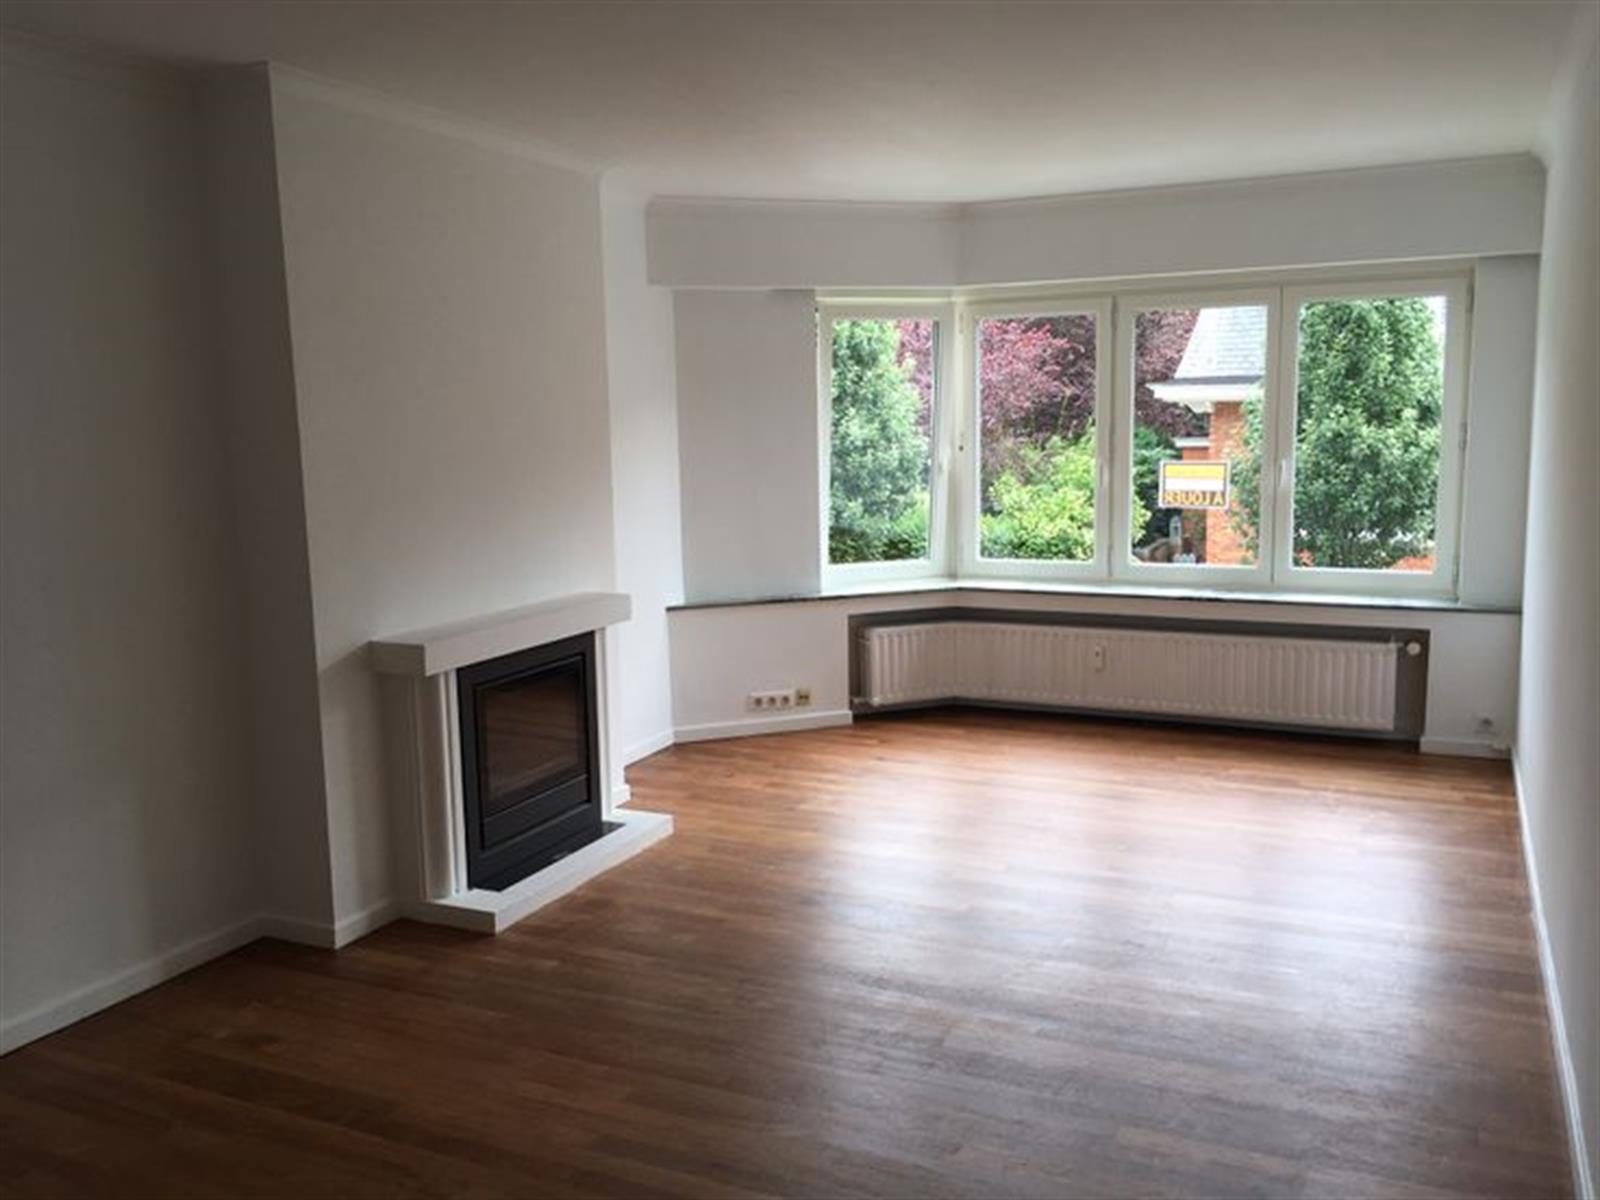 Appartement - Woluwe-Saint-Lambert - #4403252-2